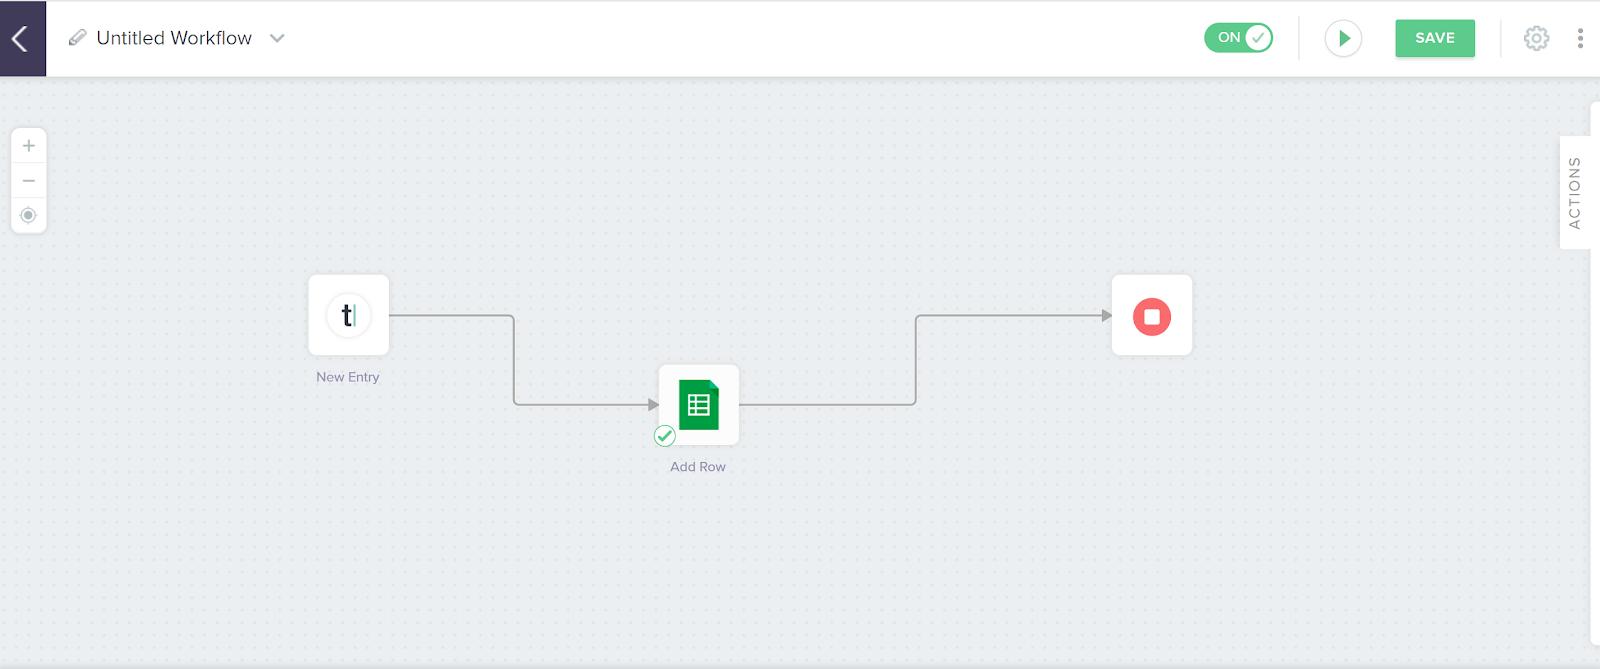 built.io workflow